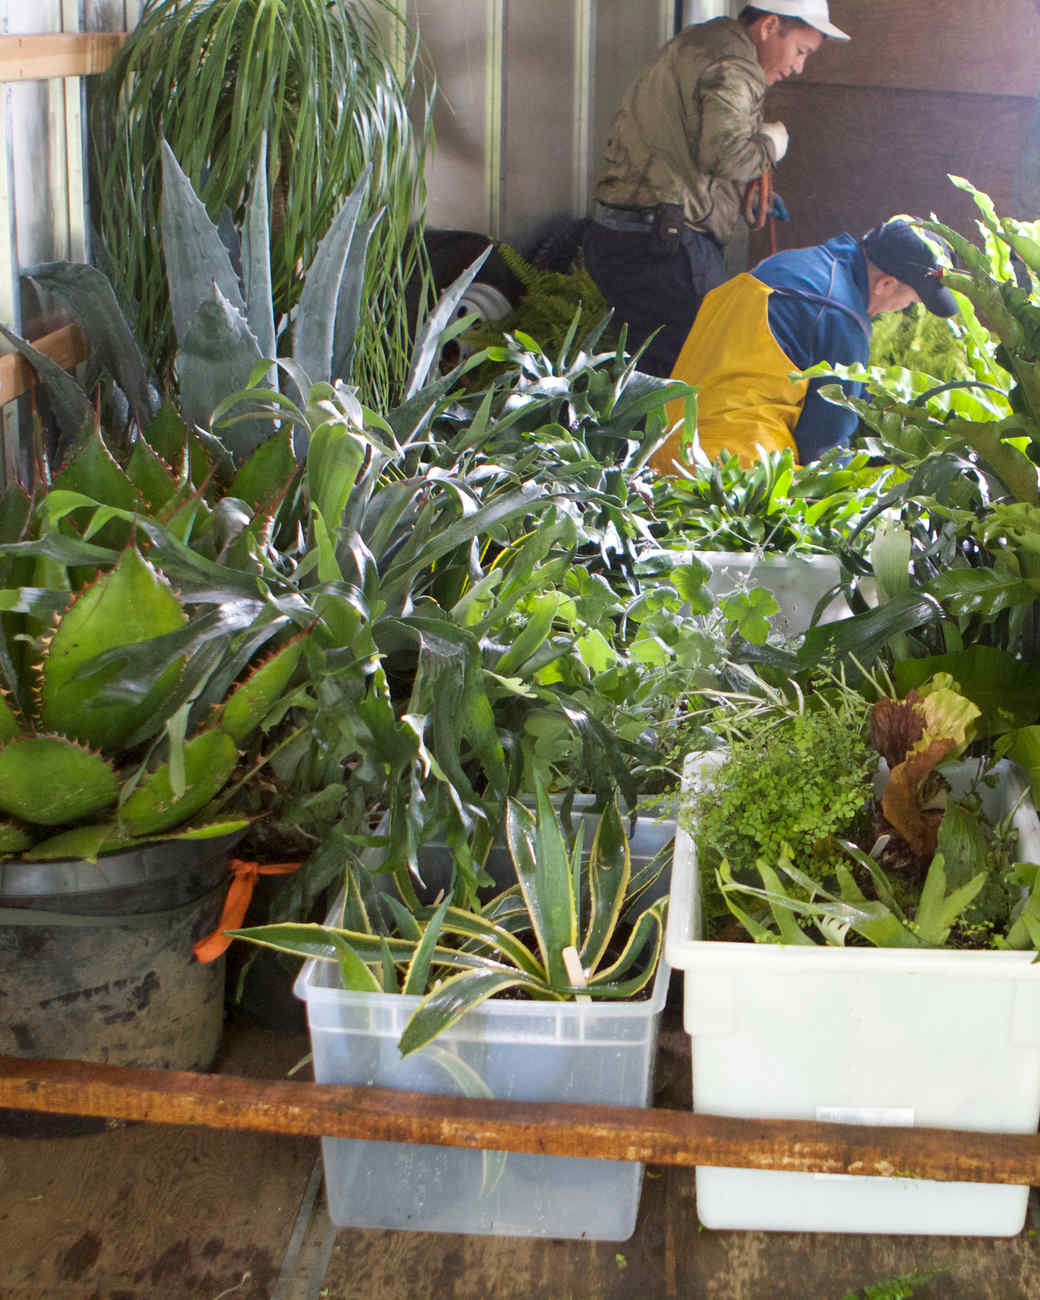 plants-to-main-17-0614.jpg